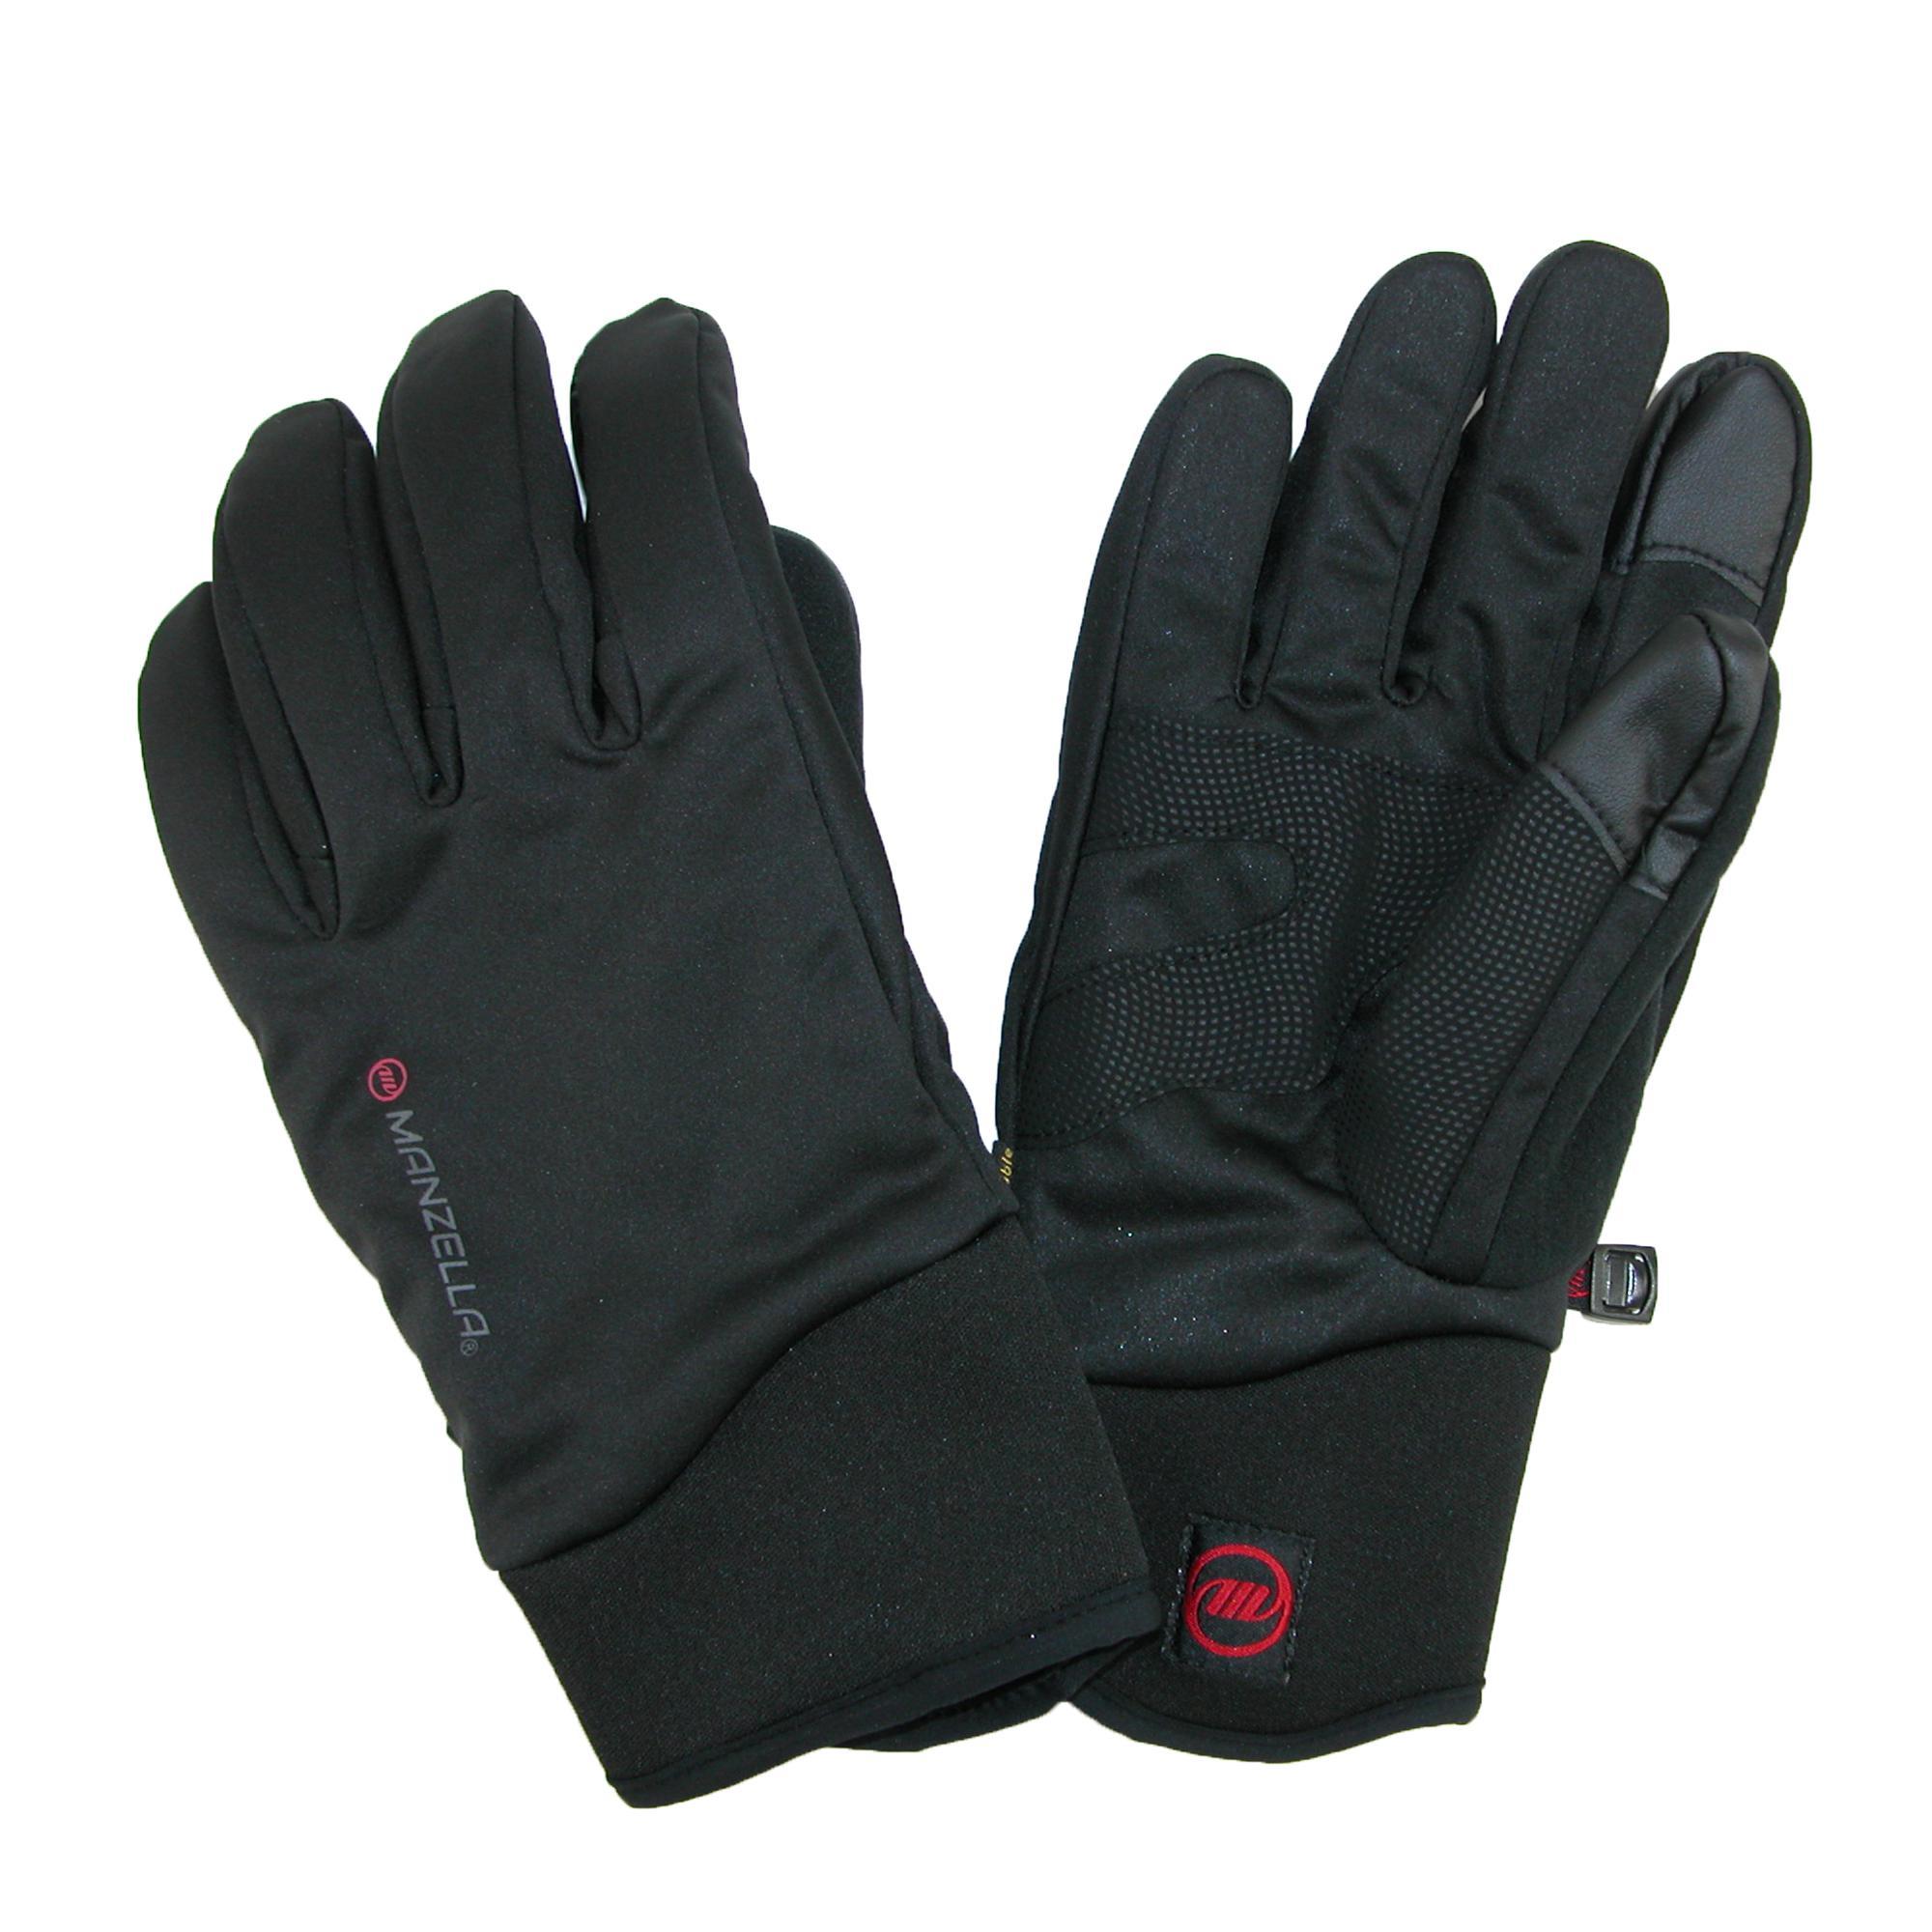 Manzella Mens All Elements 3.0 Touch Screen Waterproof Gloves